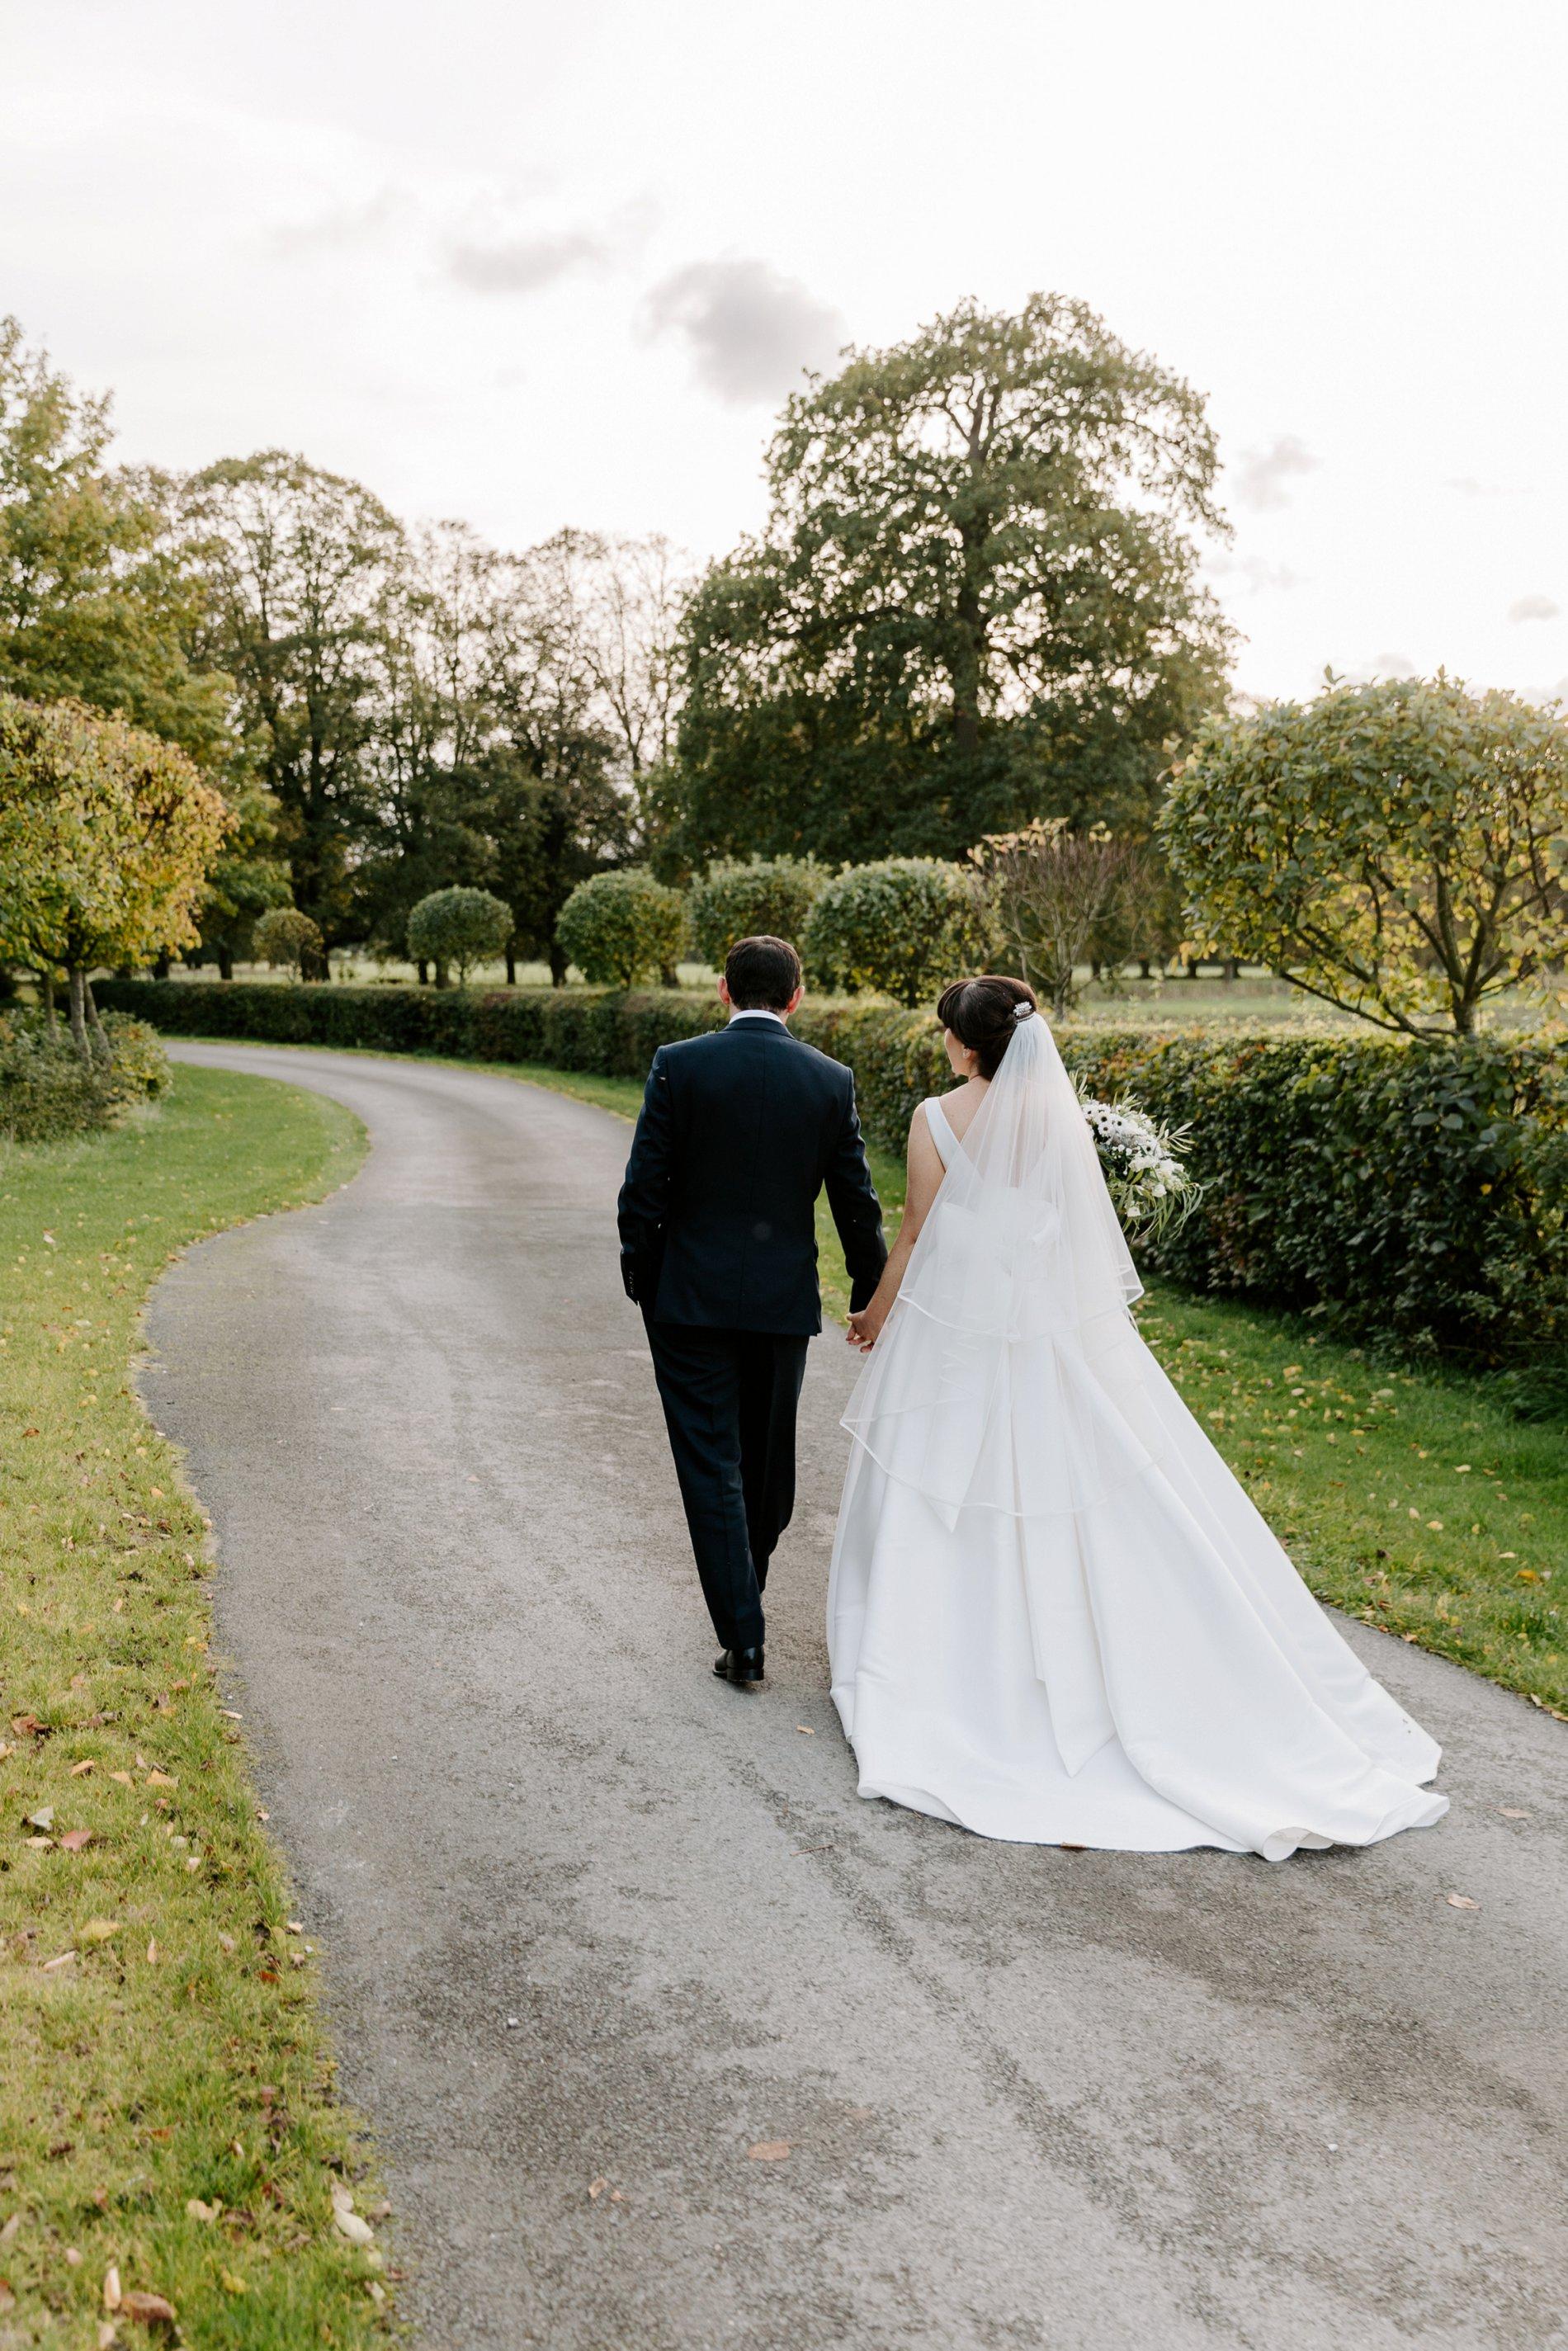 An Elegant White Wedding at Thicket Priory (c) Carla Whittingham Photography (82)